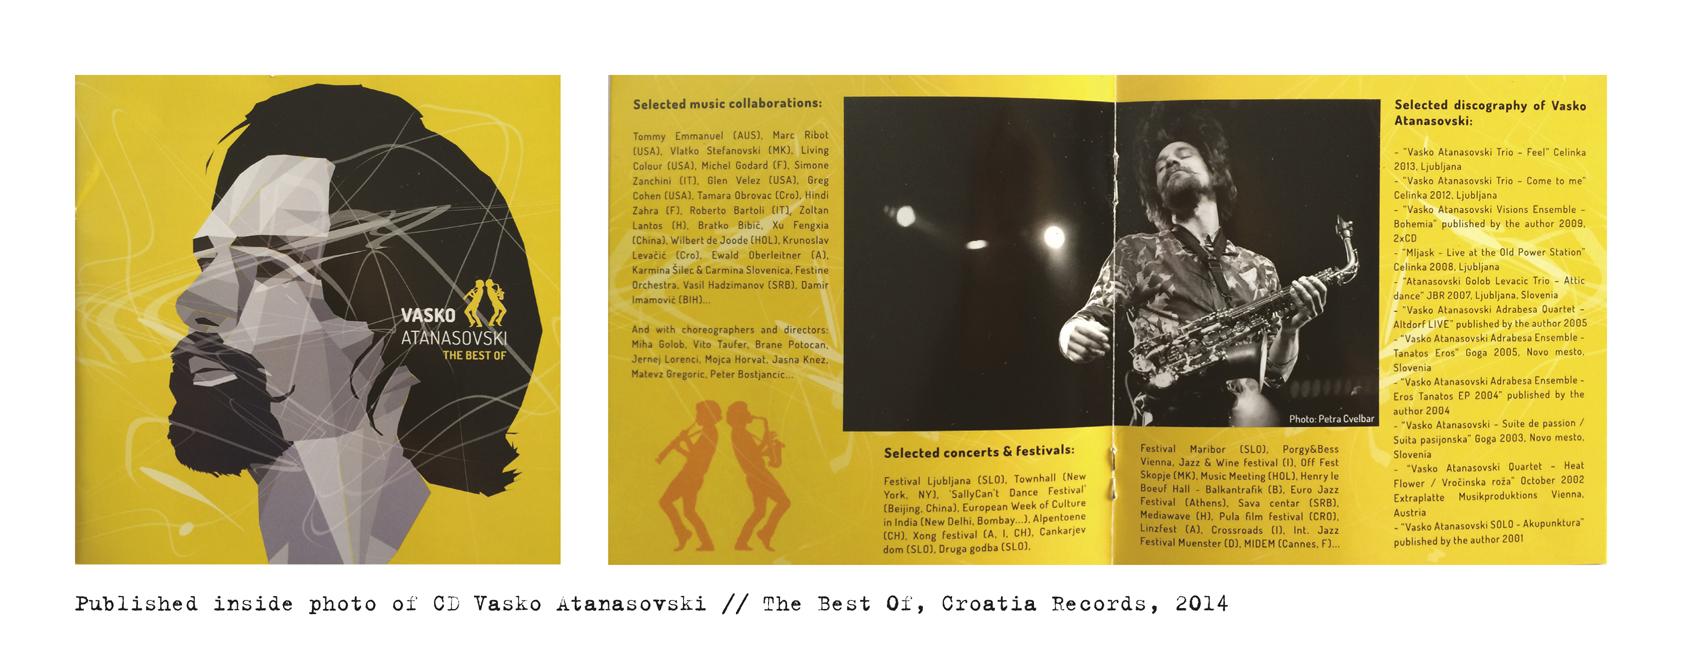 Published photo inside Vasko Atanasovski CD The Best Of